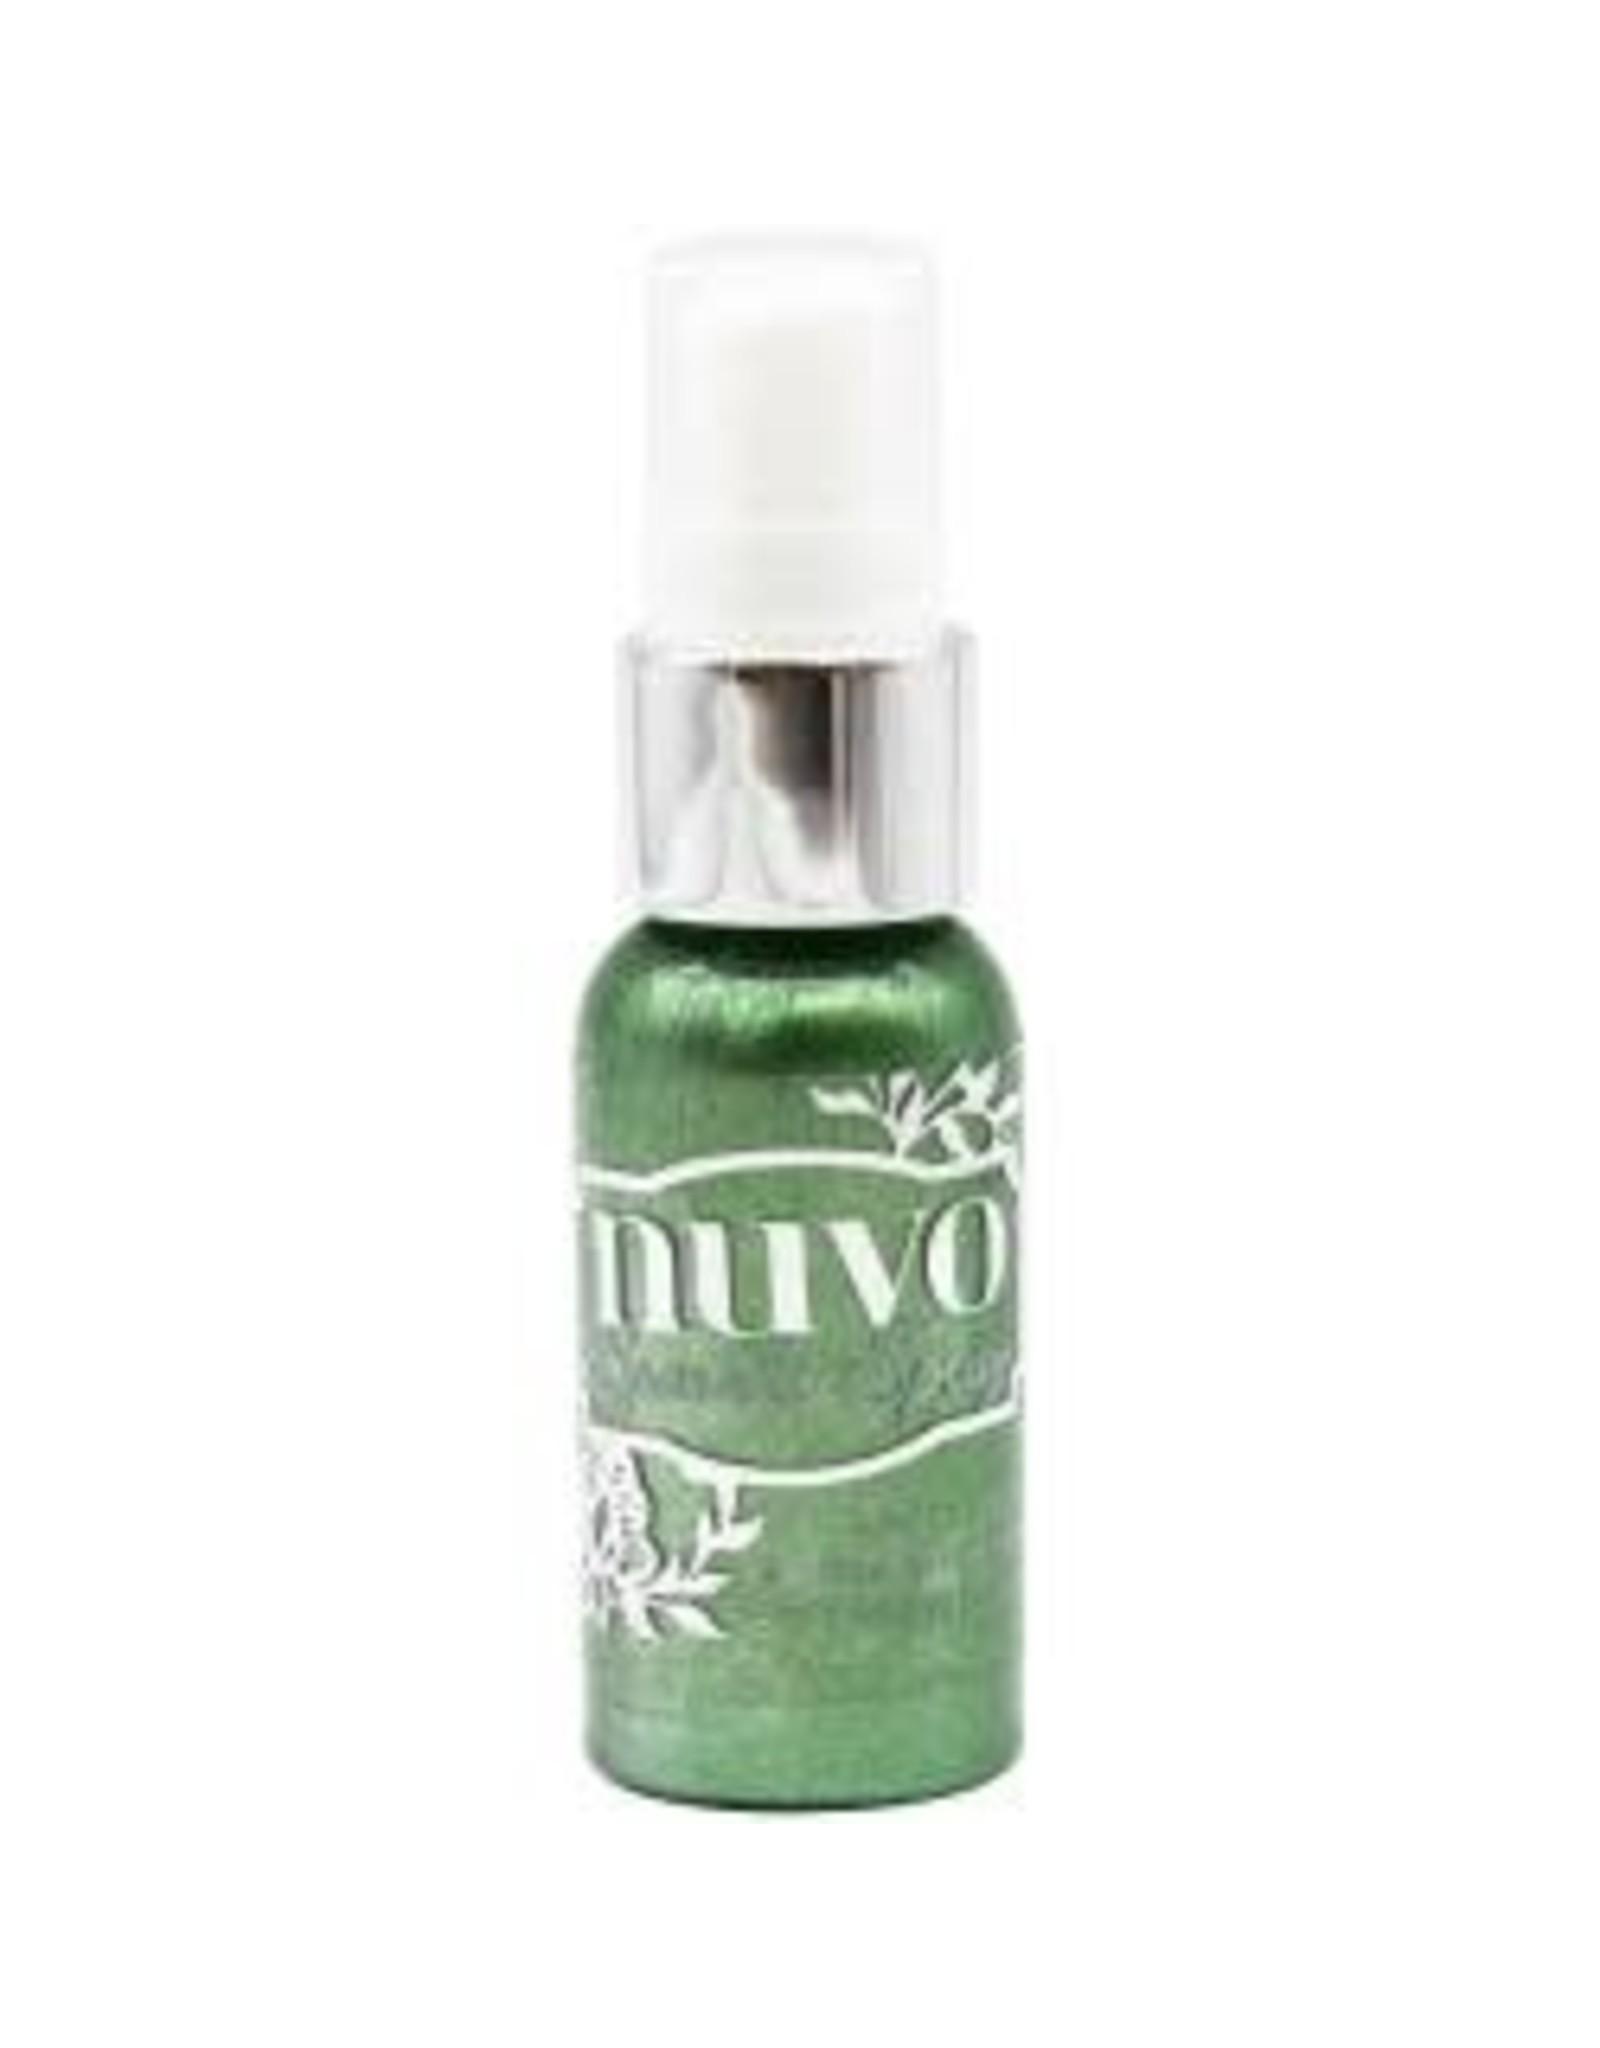 Nuvo Nuvo Sparkle Spray - Wispy Willow